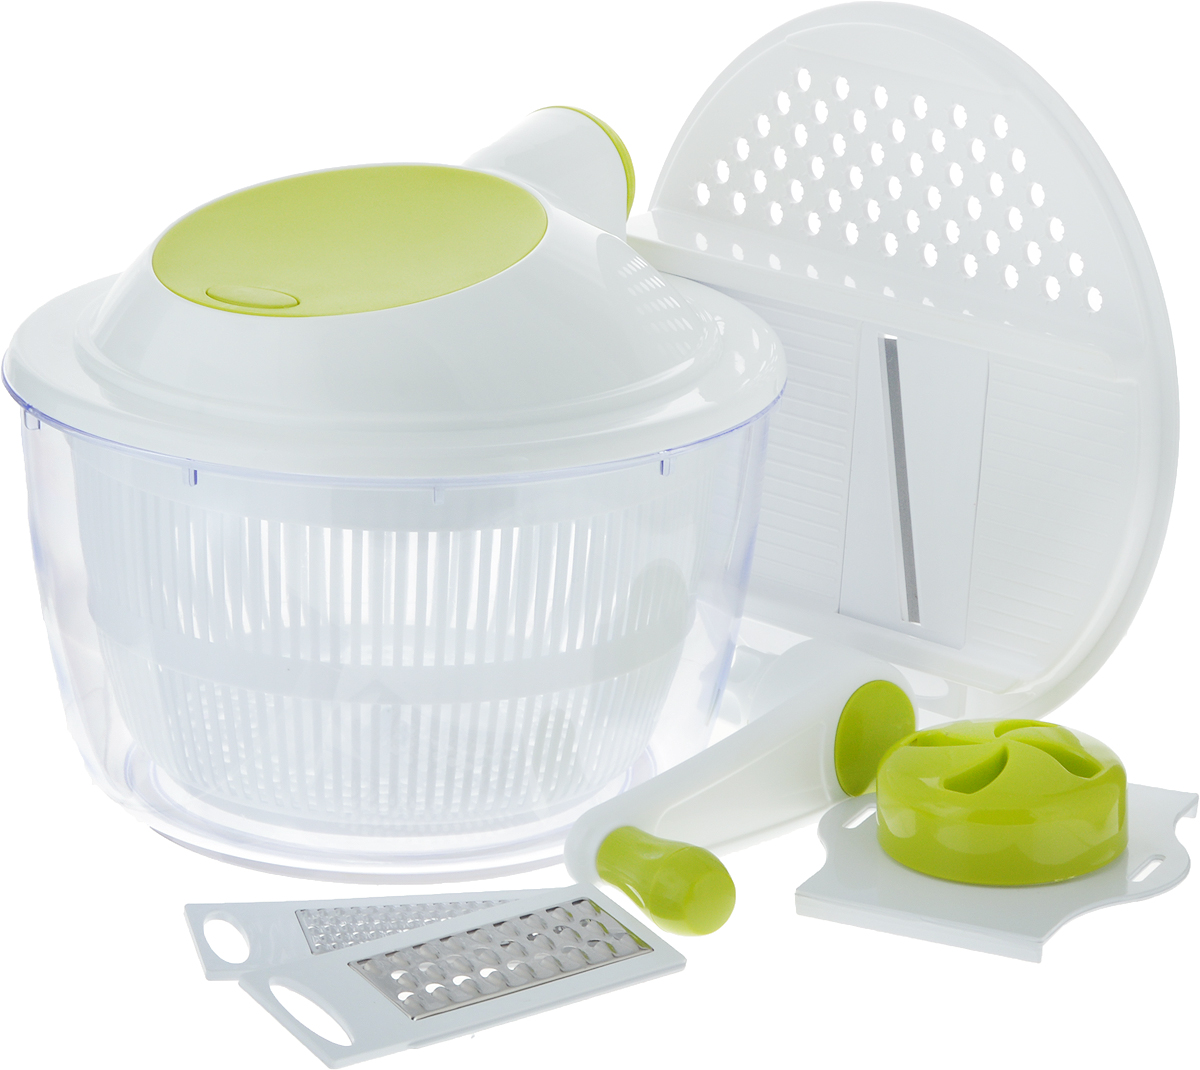 Овощерезка As Seen On TV Salad Marker Set. FM-4010 овощерезка salad gourmet bradex